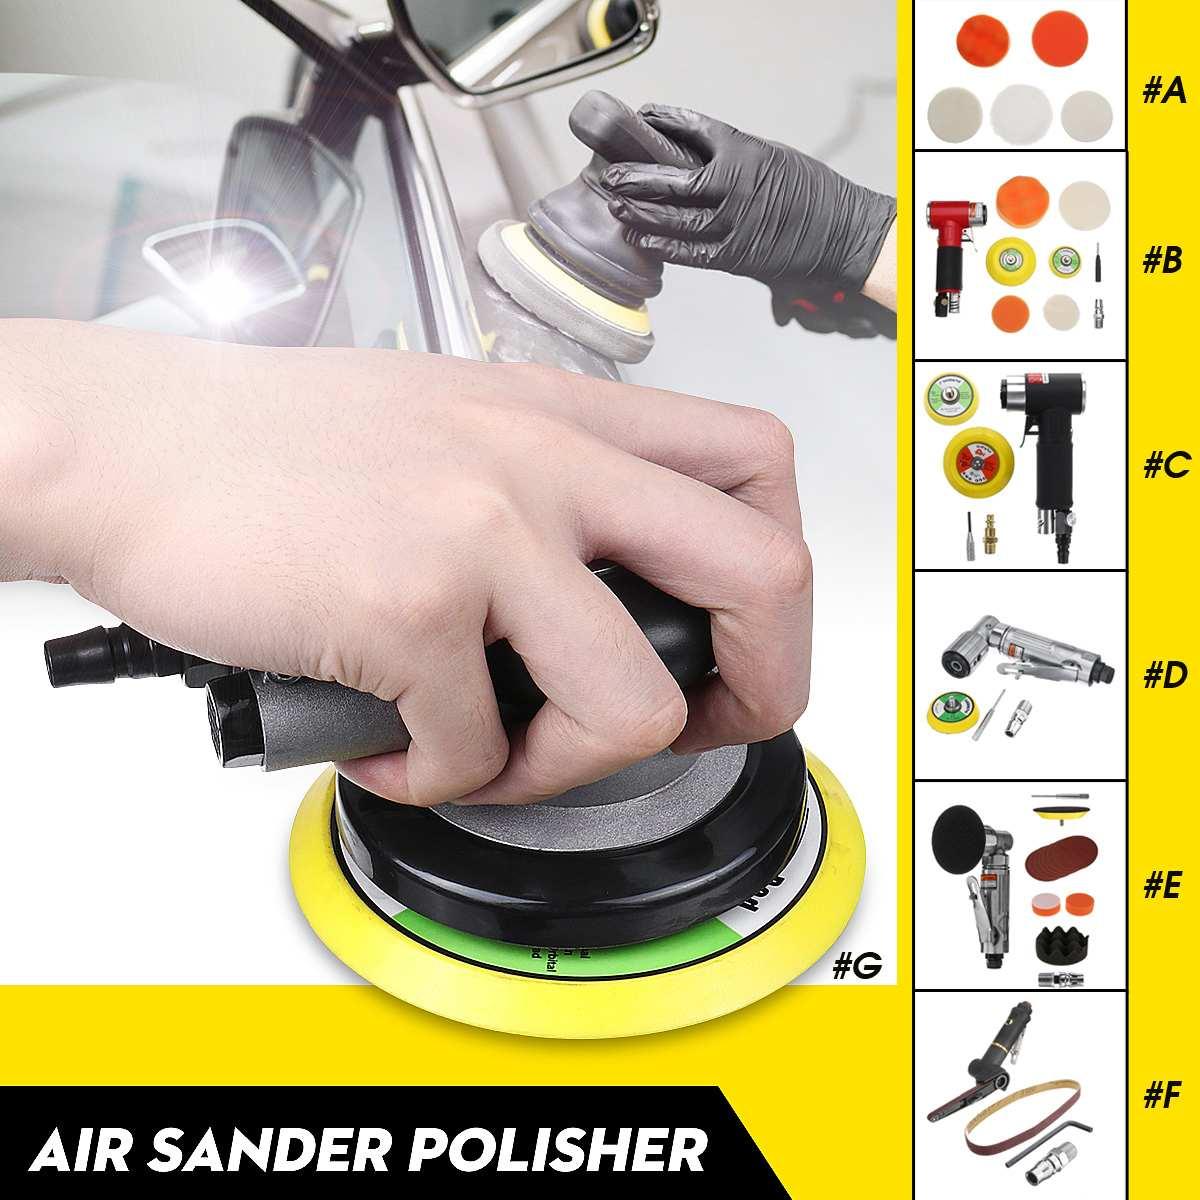 Air Sander Polisher Dual Action Random Orbital Polishing Pad Car Pneumatic Grinding For Car Paint Care Tool